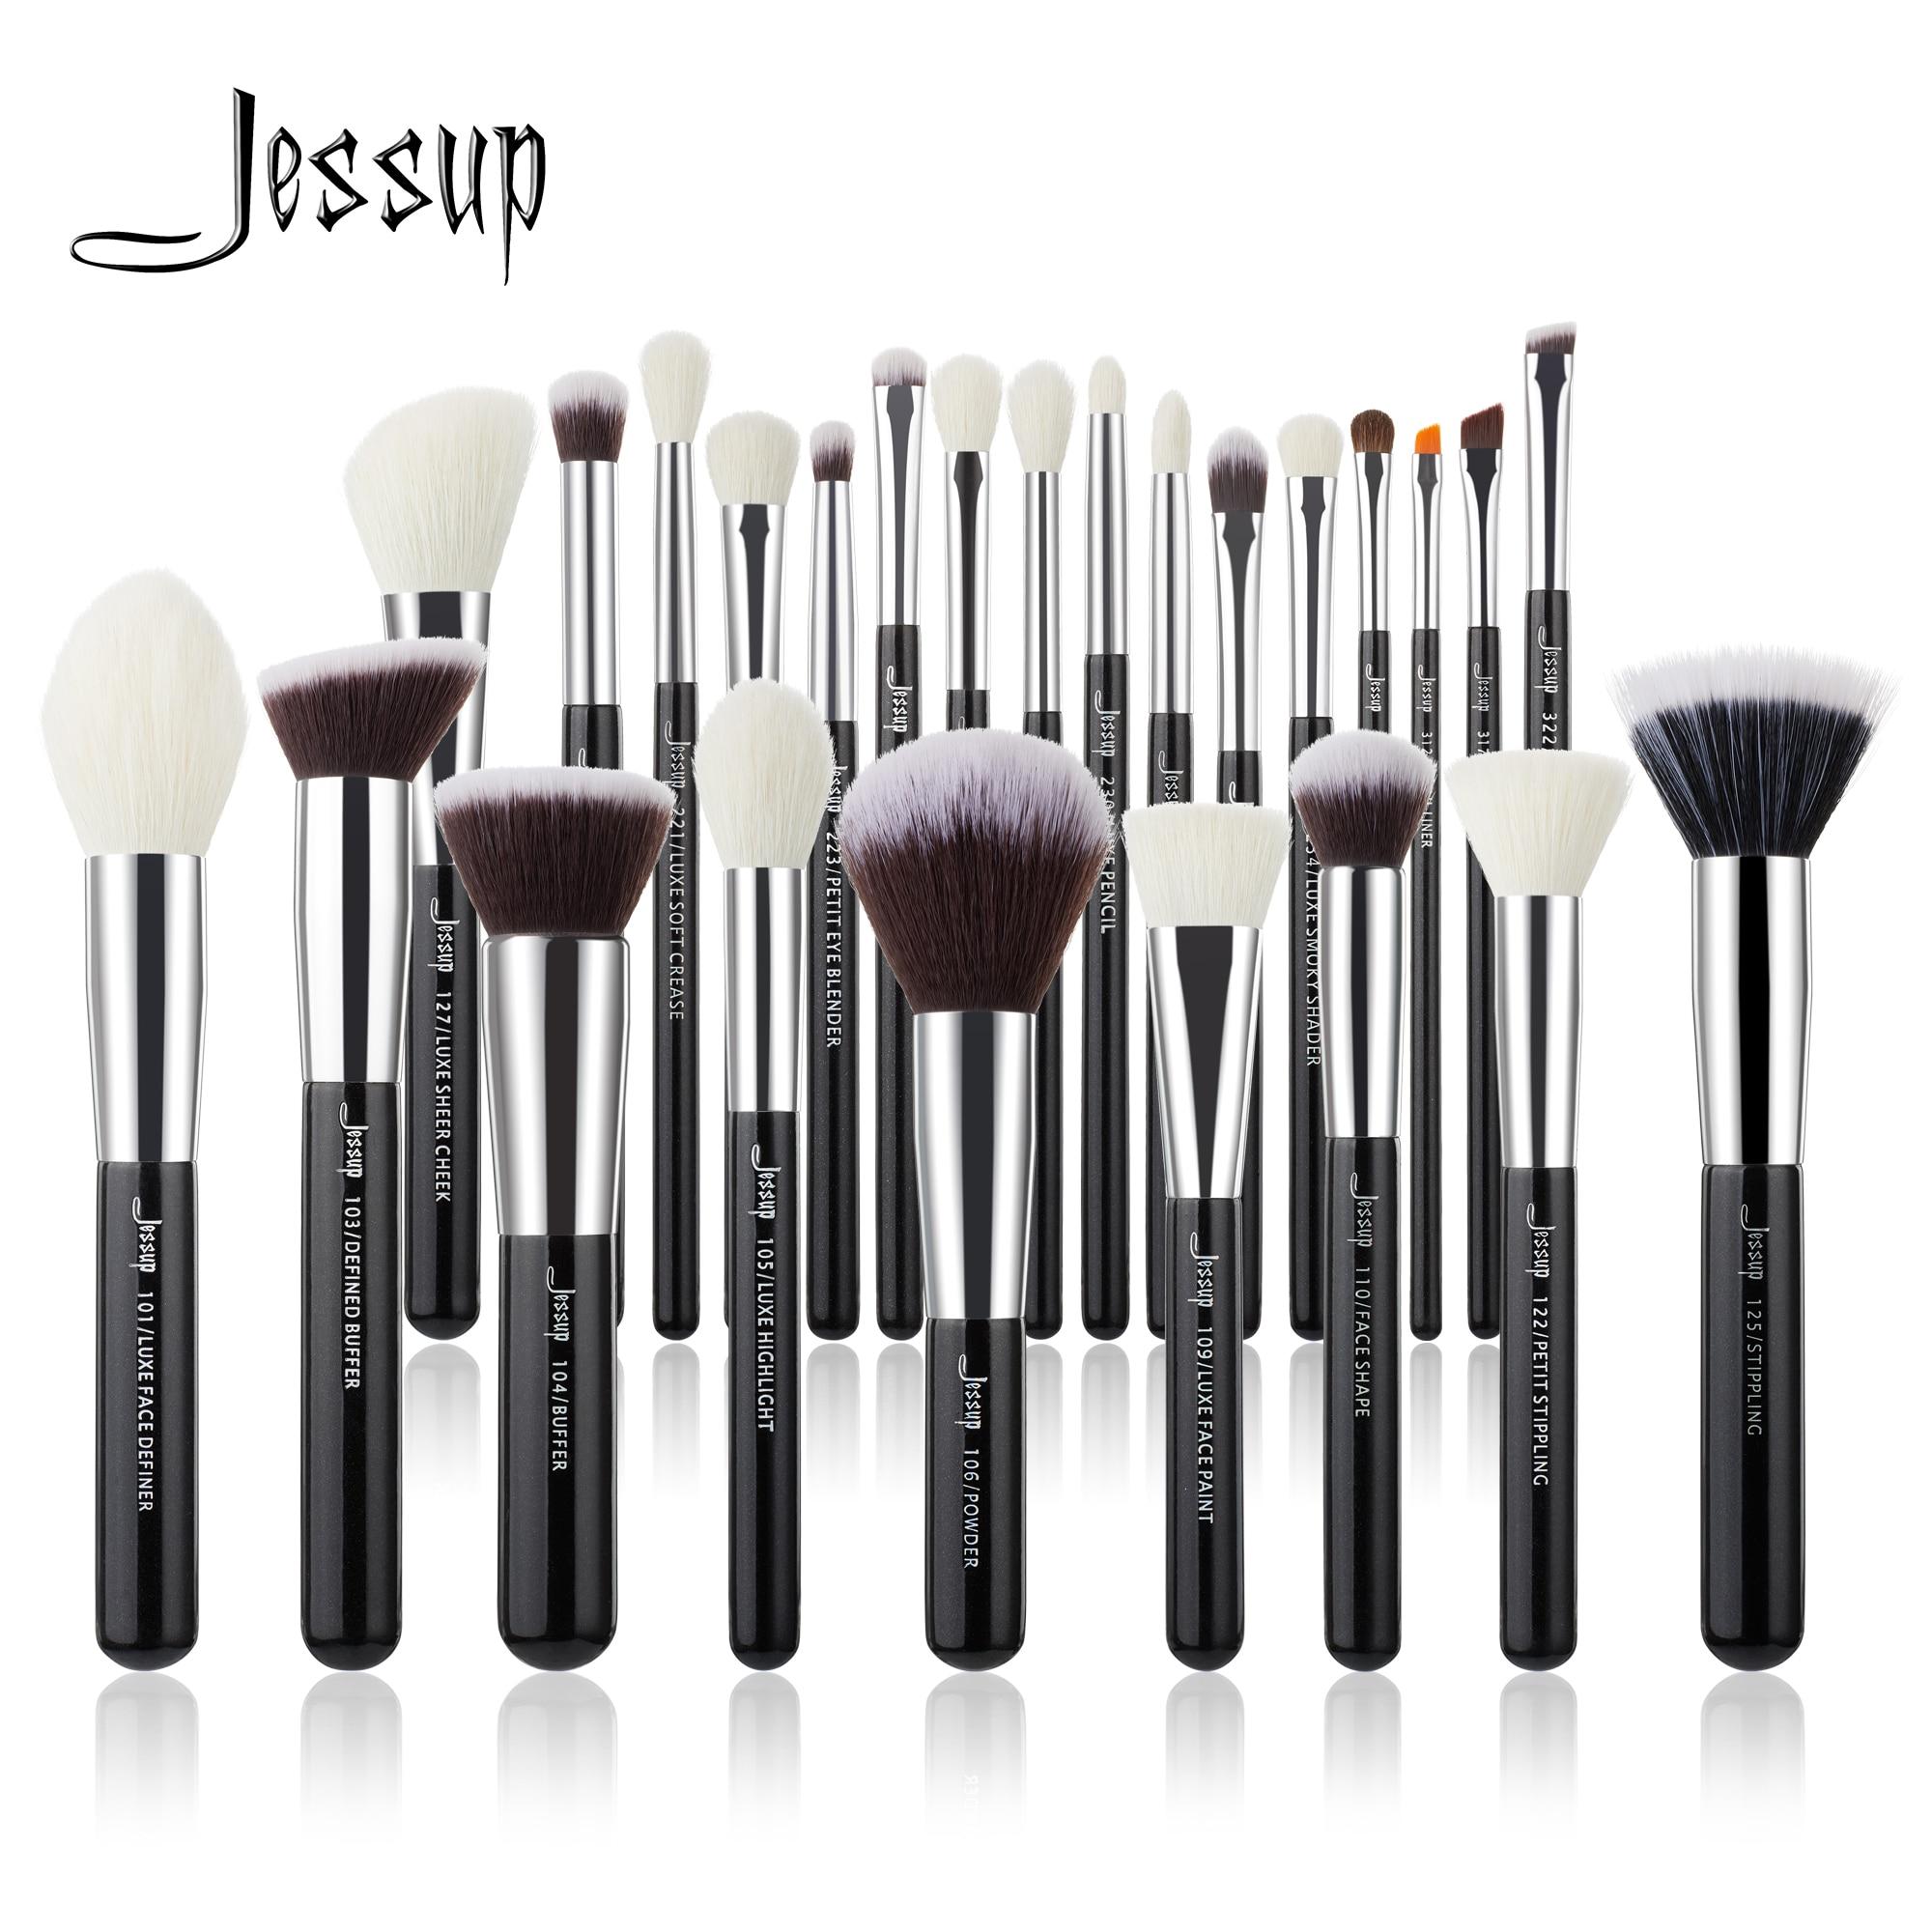 aliexpress.com - Jessup Makeup brushes set Black/Silver Professional with Natural Hair Foundation Powder Eyeshadow Make up Brush Blush 6pcs-25pcs